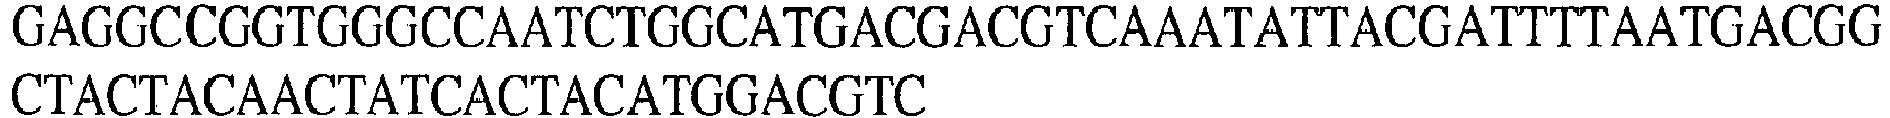 Figure imgb0449